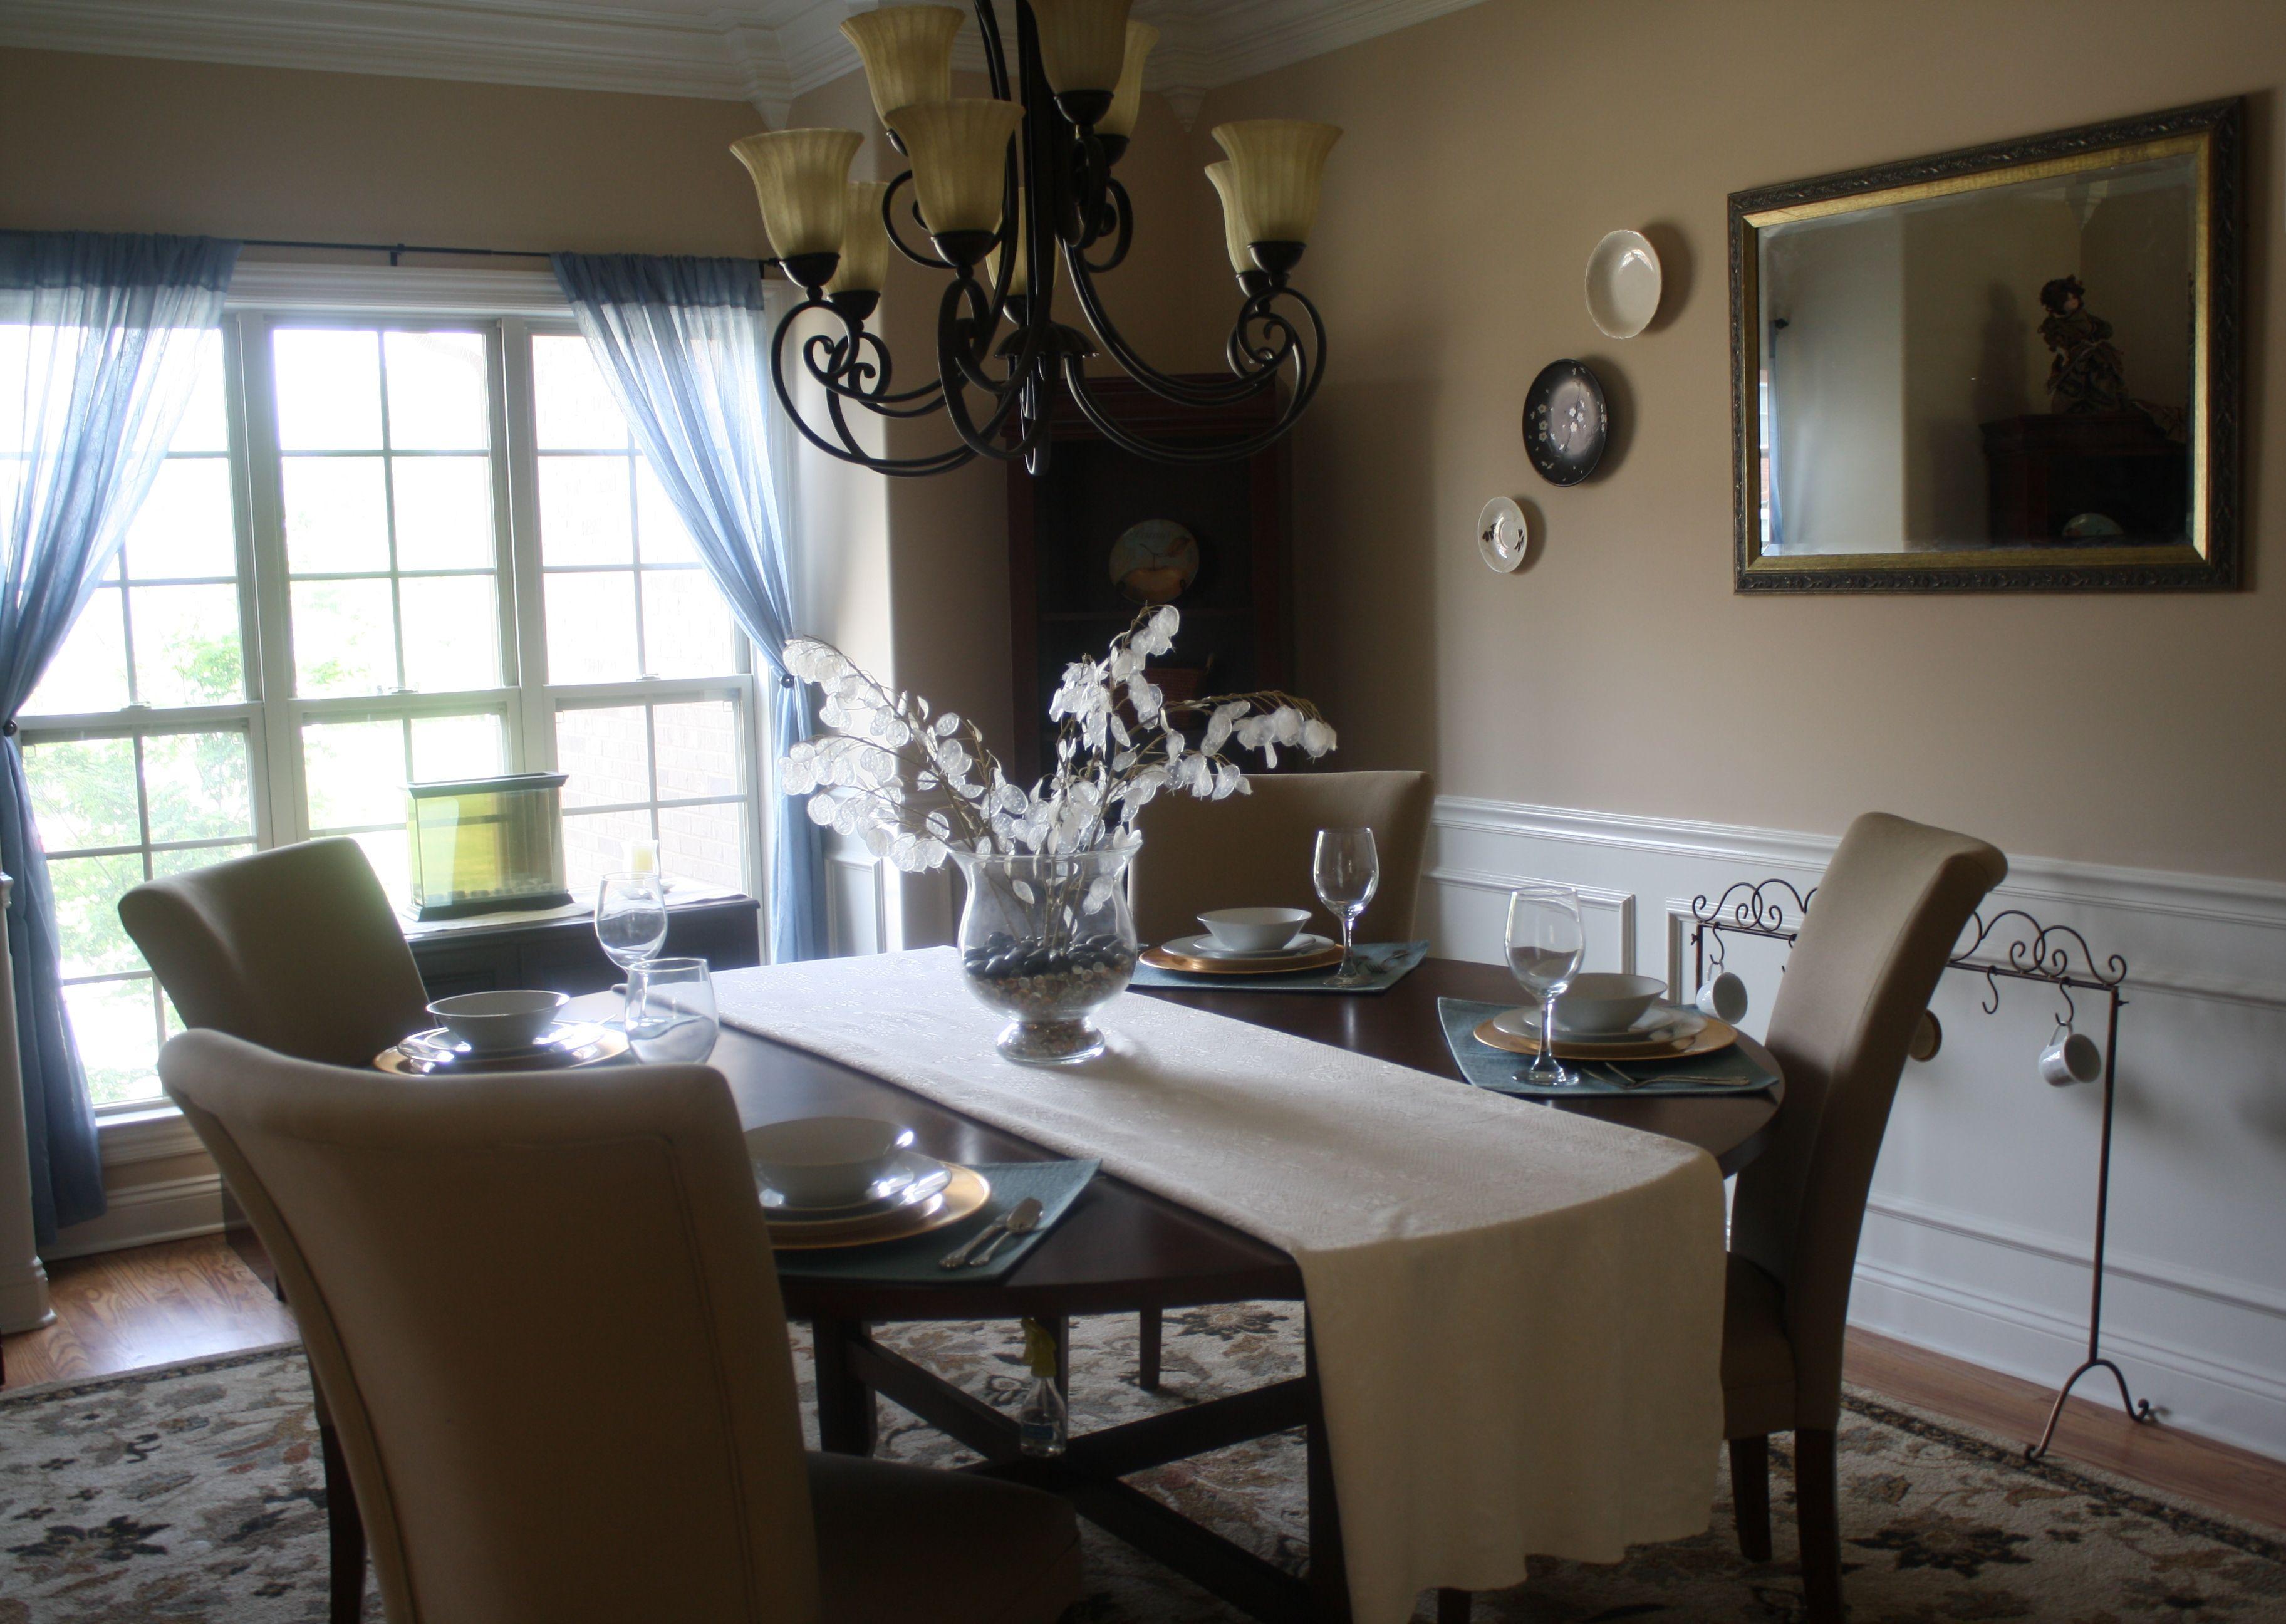 40 Beautiful Minimalist Dining Room Decor Ideas With Farmhouse Style